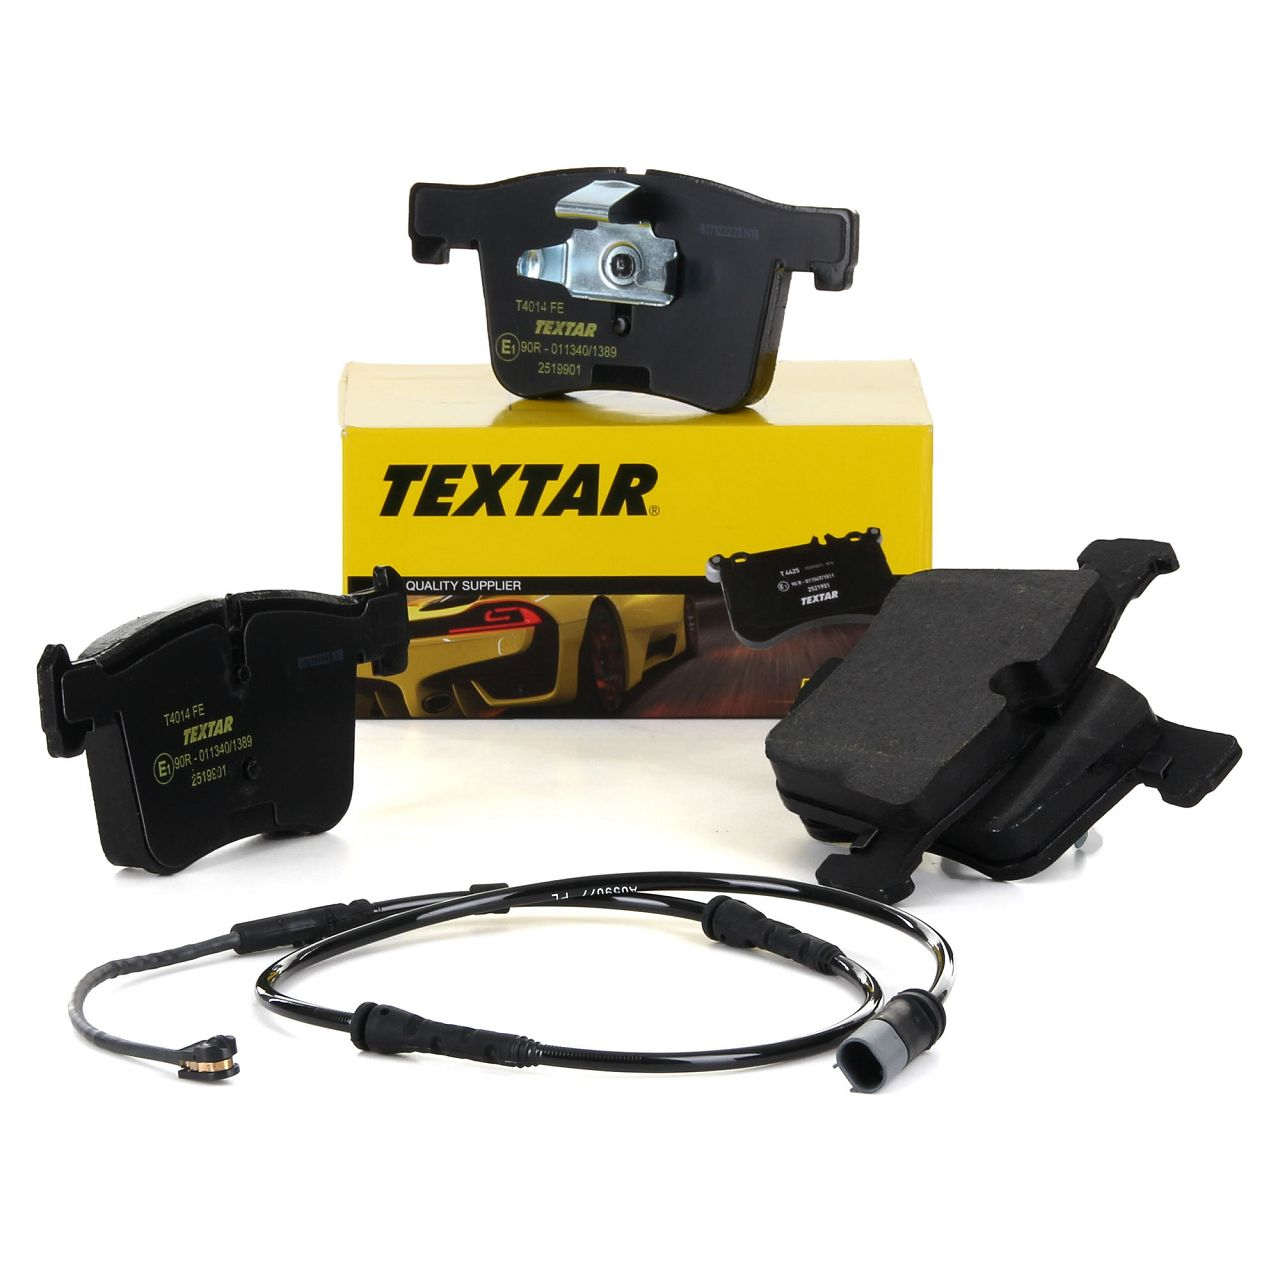 TEXTAR 2519901 Bremsbeläge + Wako BMW X3 F25 X4 F26 18-35i 18-35d vorne